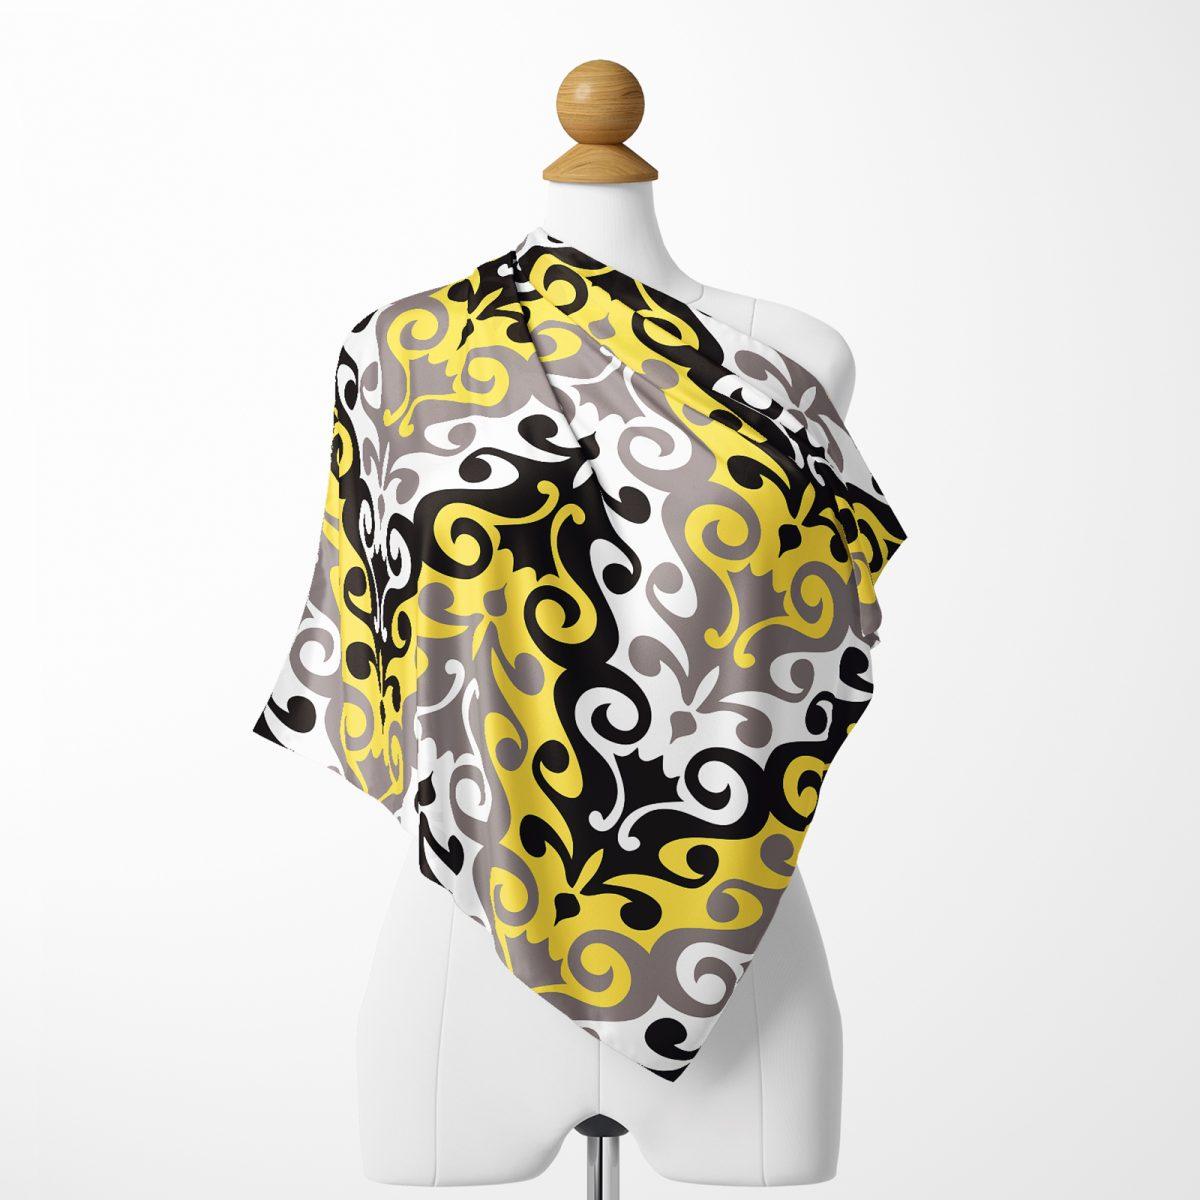 Realhomes Özel Seri Dijital baskılı Modern Tivil Eşarp Realhomes